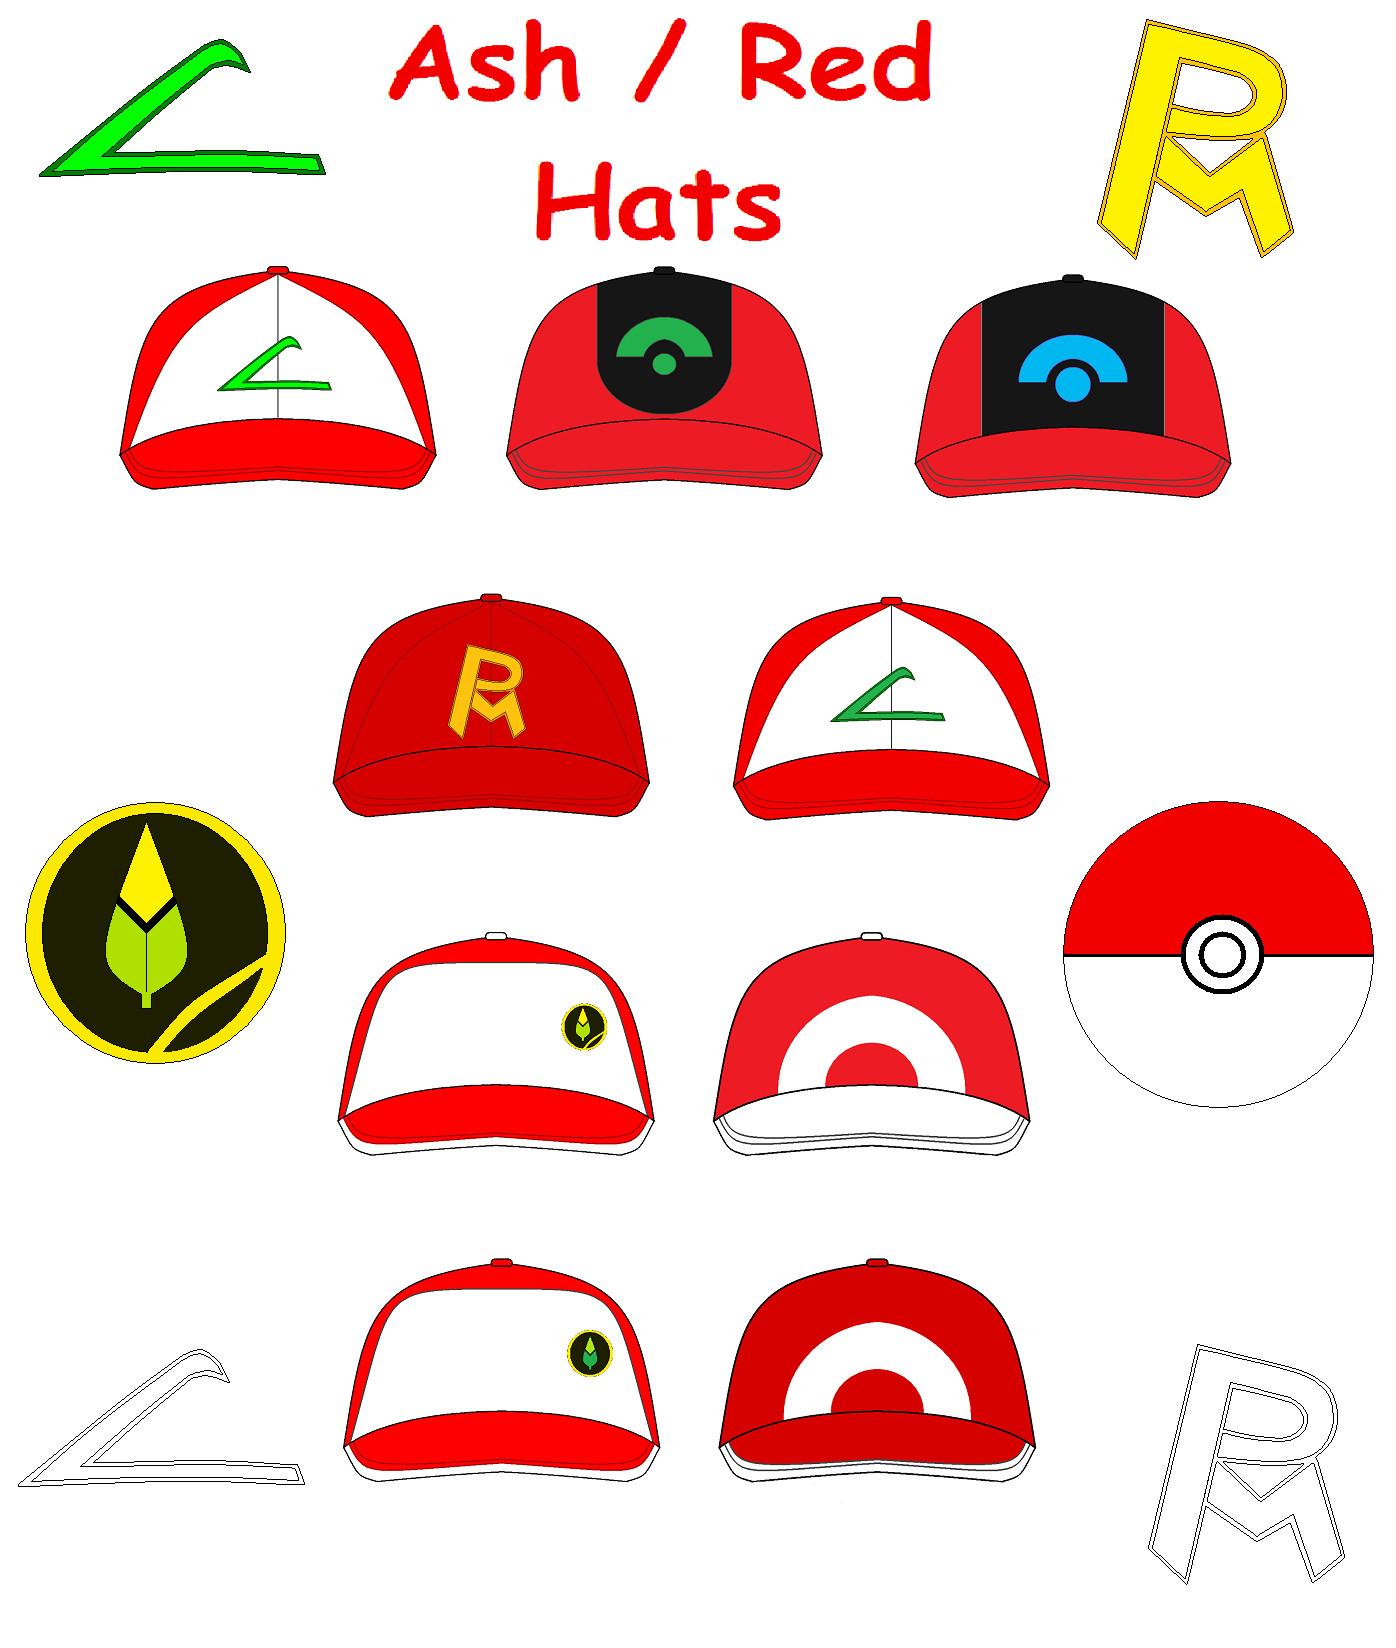 Ash And Red Hats By Saiturtlesninjanx On Deviantart